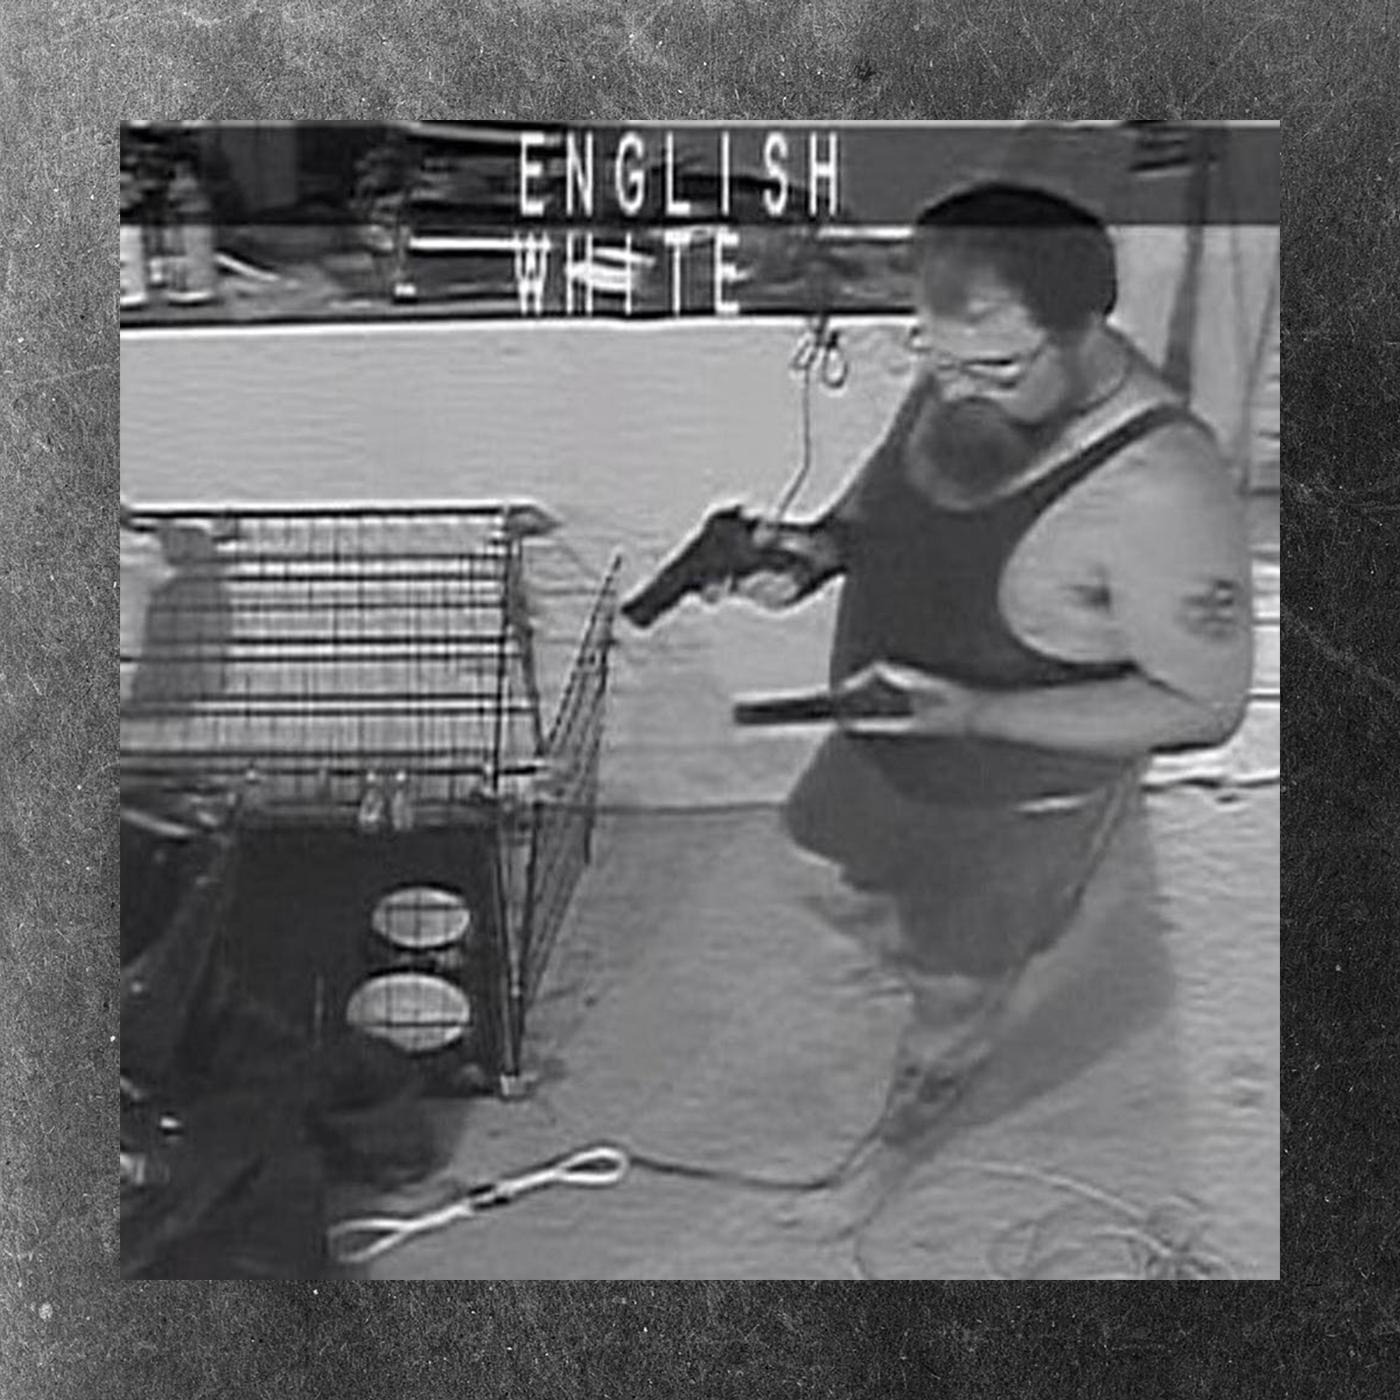 Craigslist Killer of Wyoming, Michigan